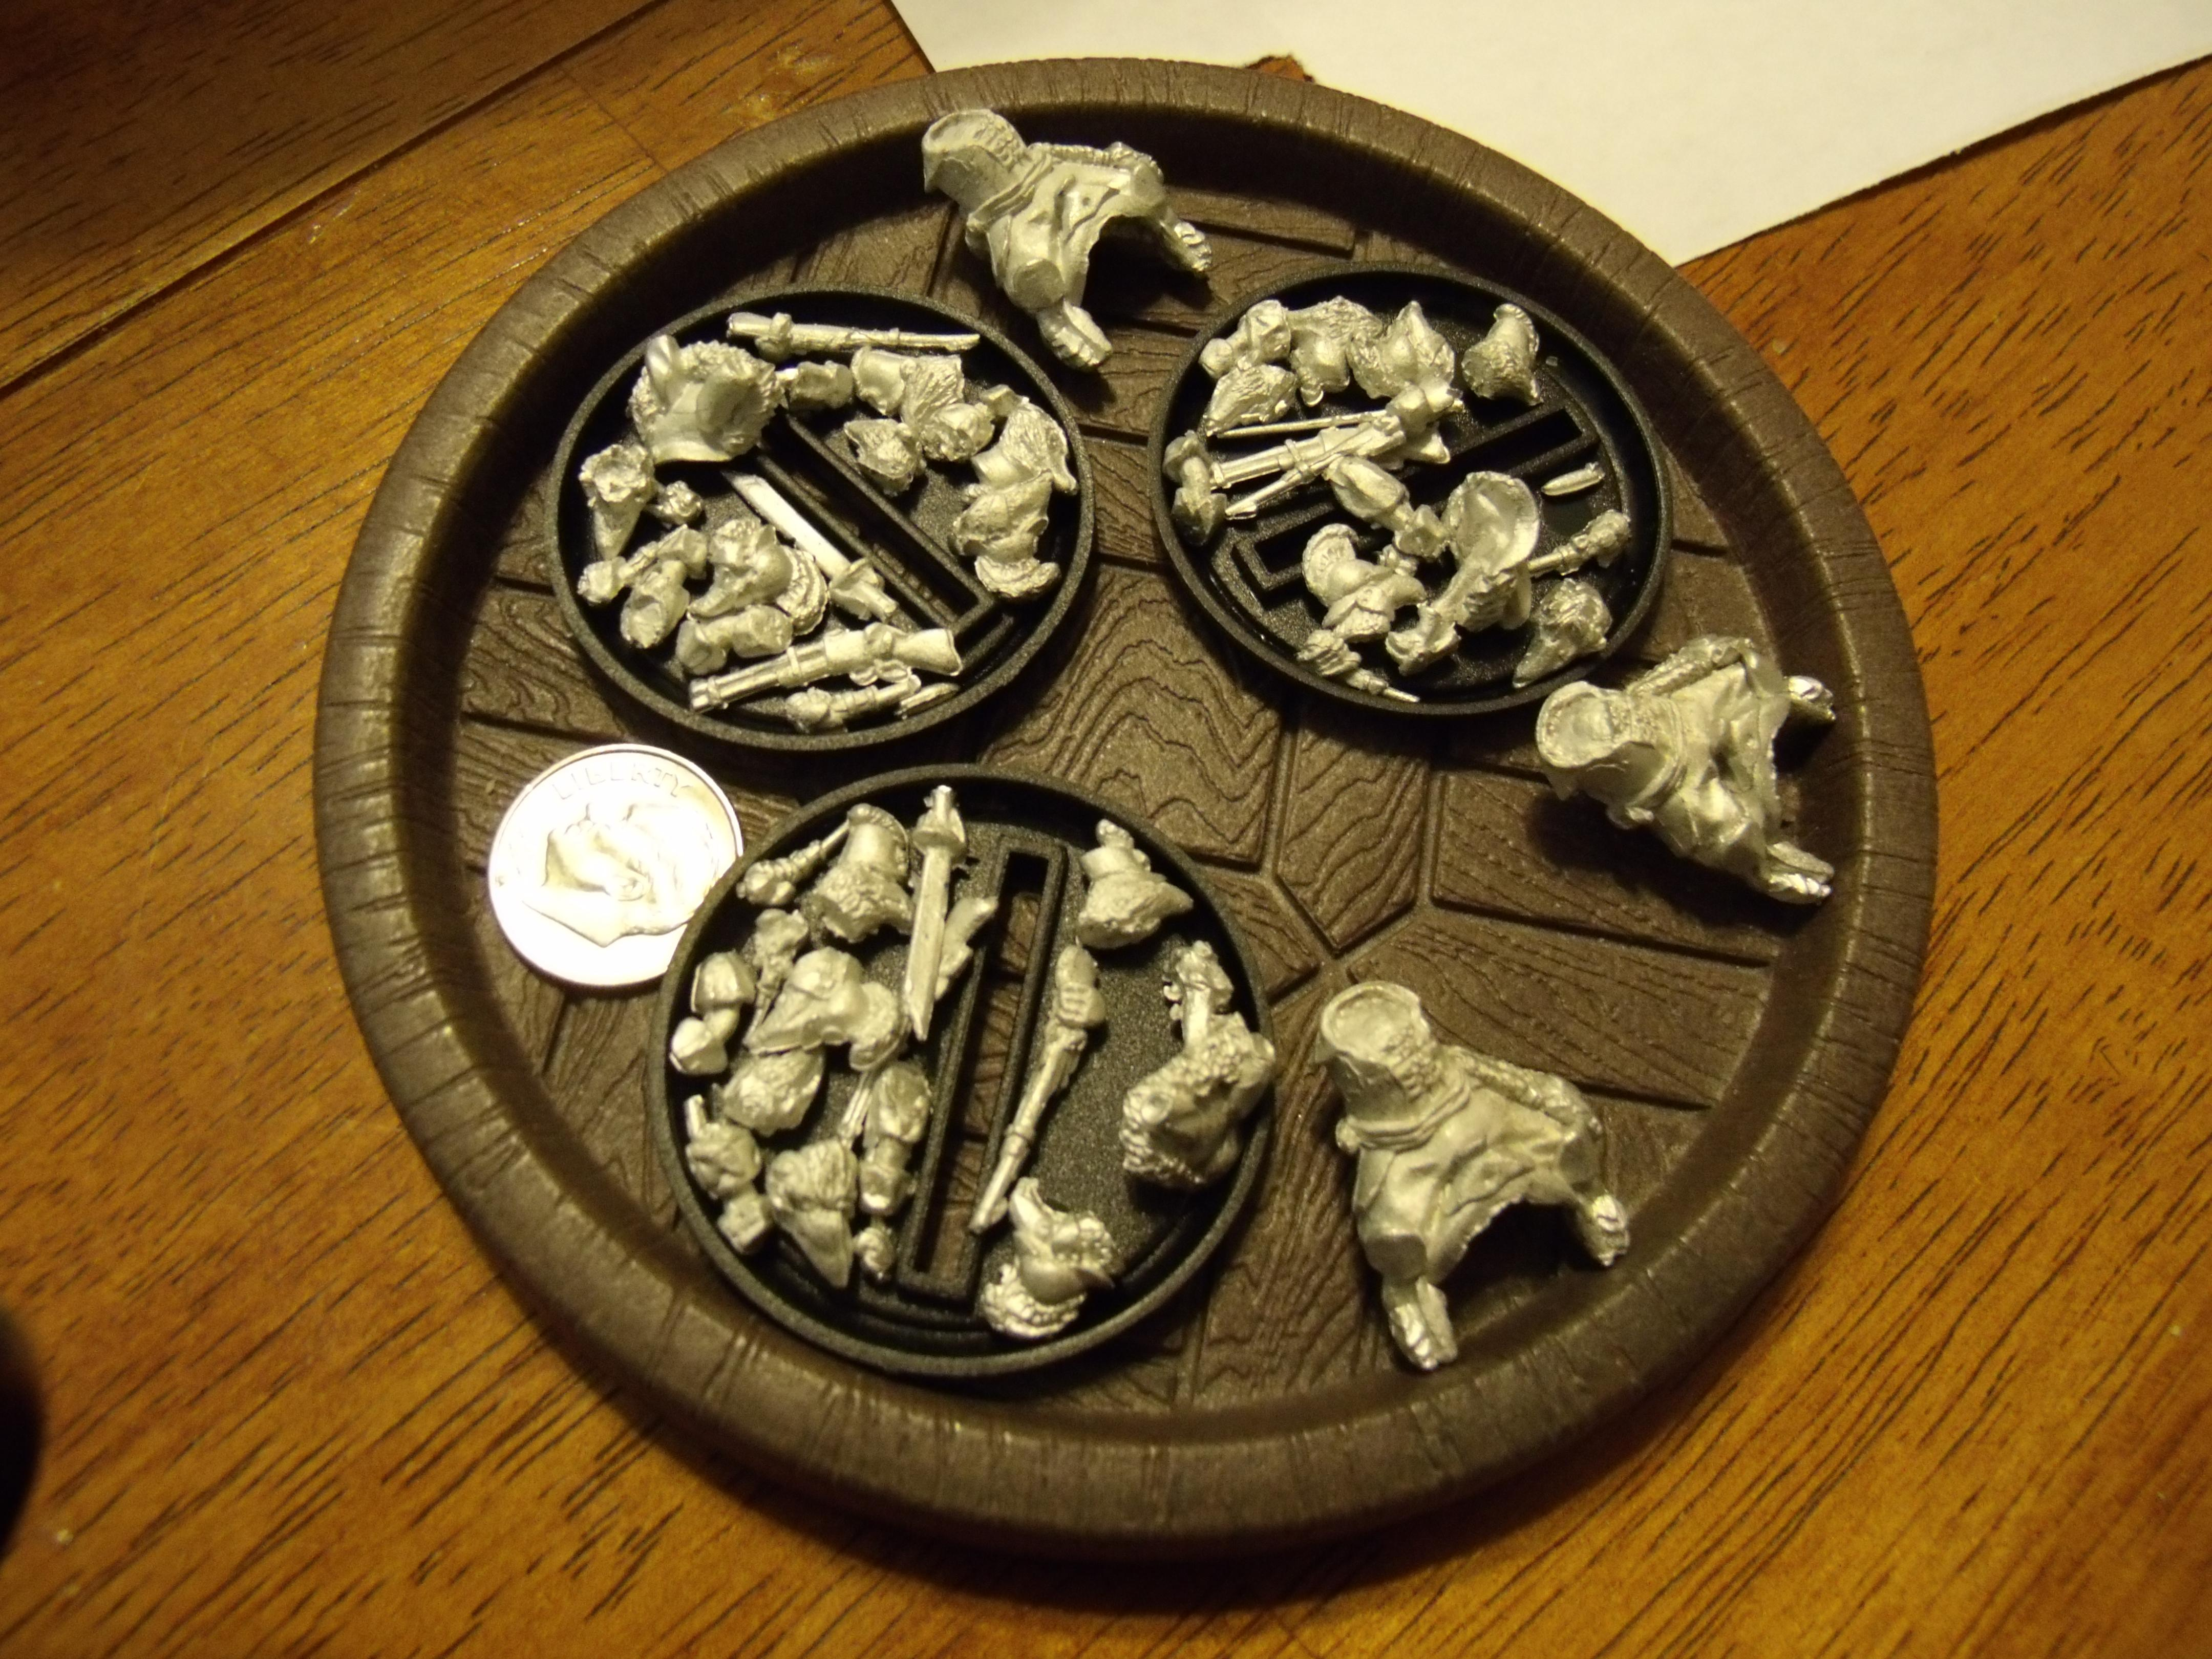 Shrew Hussar / Carbineer bits